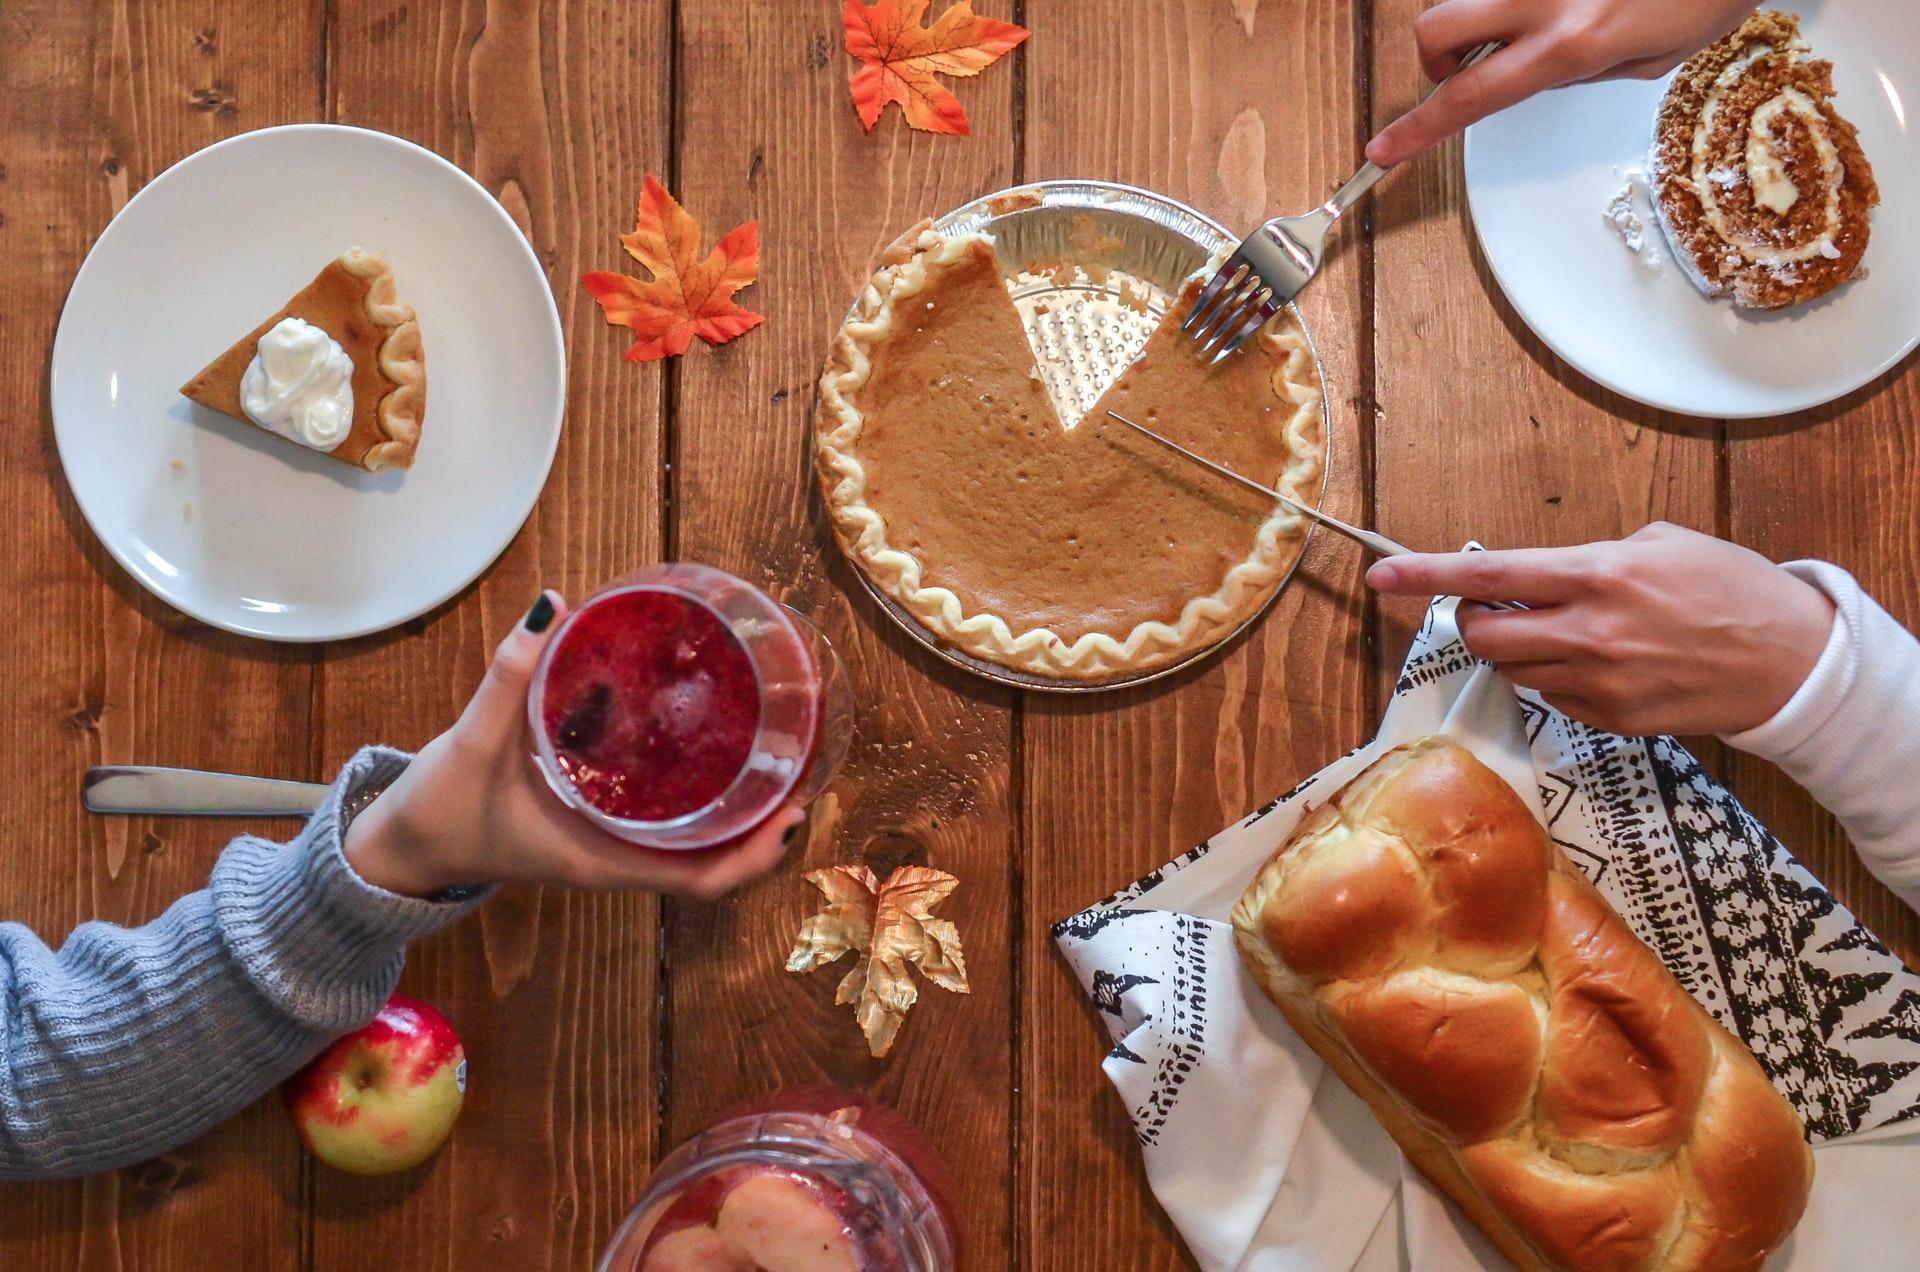 why does a turkey dinner make you feel sleepy?